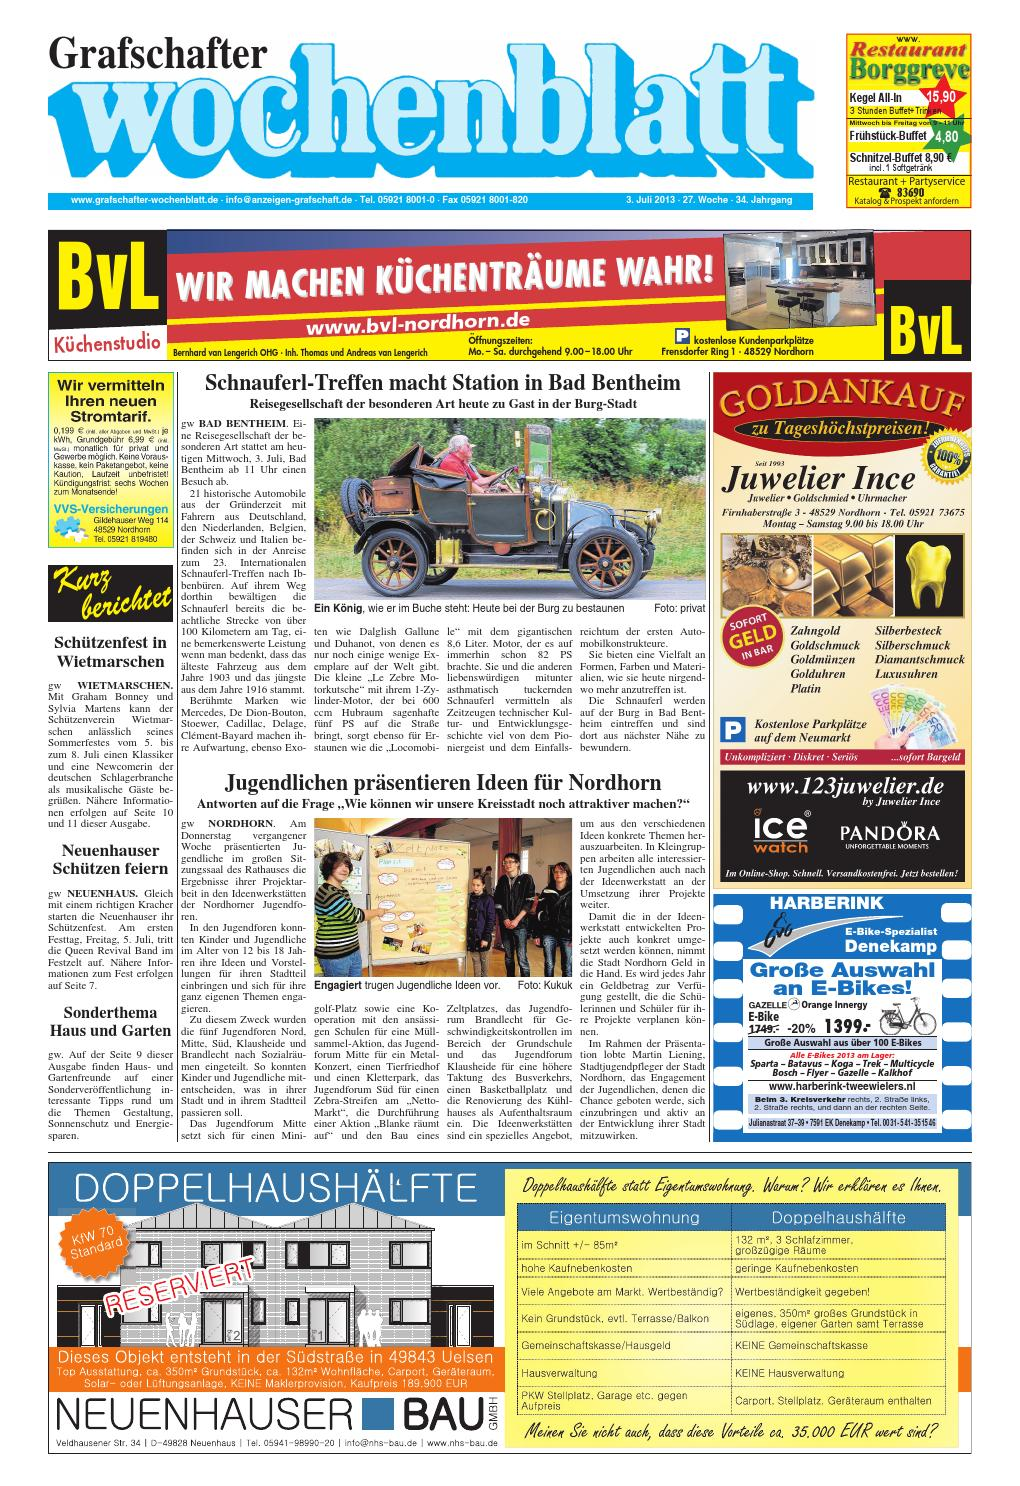 Gw03 07 2013 By SonntagsZeitung   Issuu